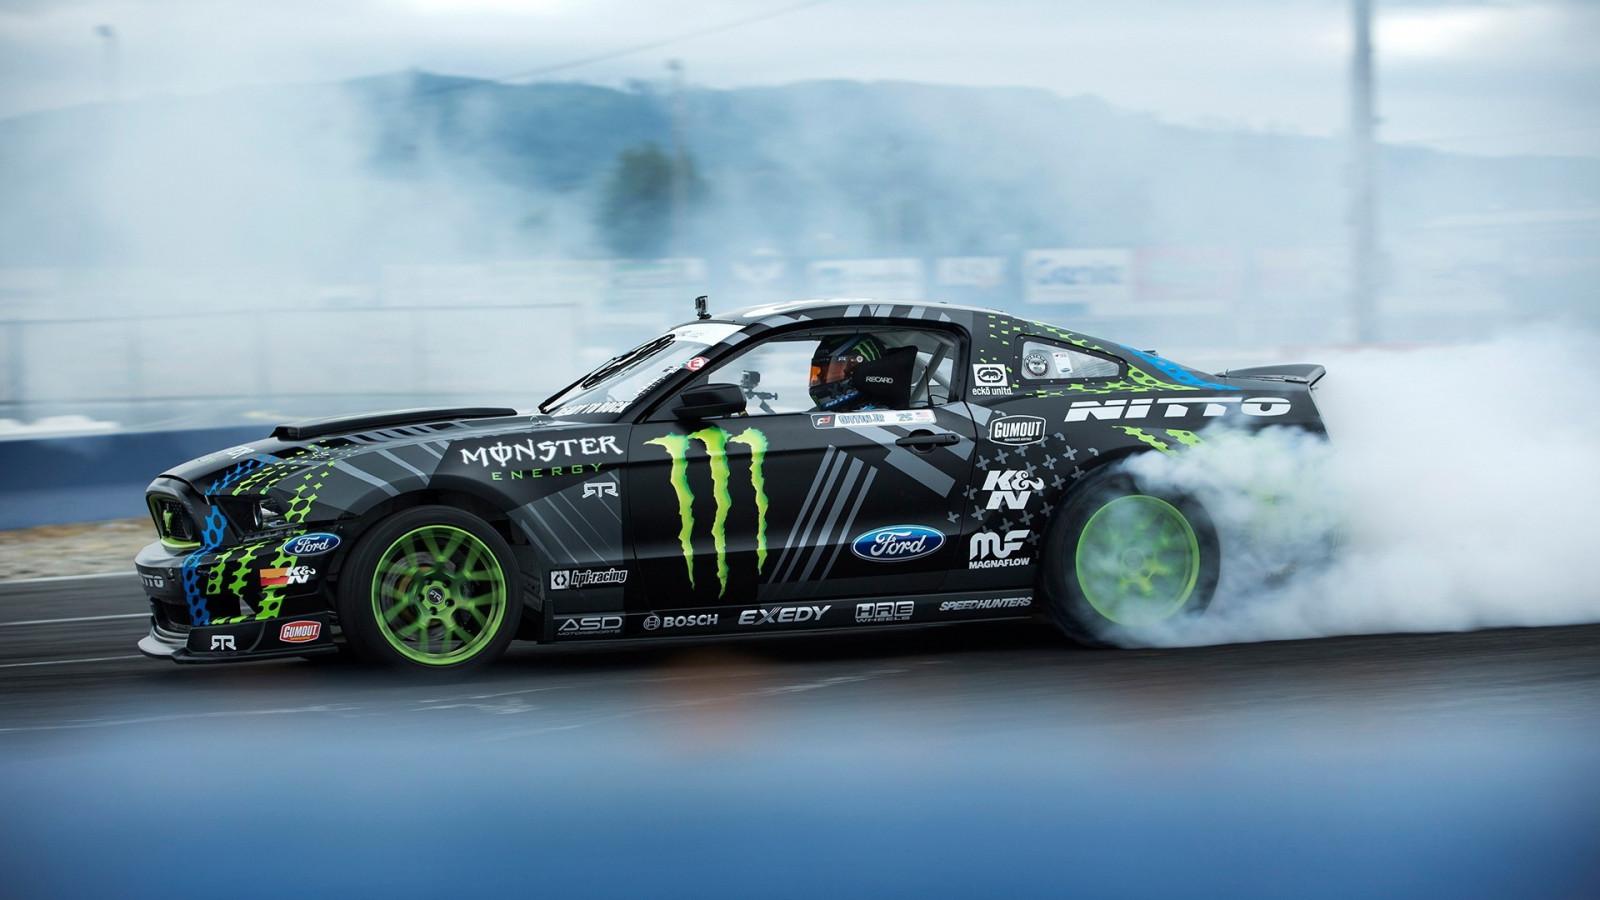 Ken Block Hd Wallpaper Wallpaper Race Cars Ford Mustang Drifting Sports Car